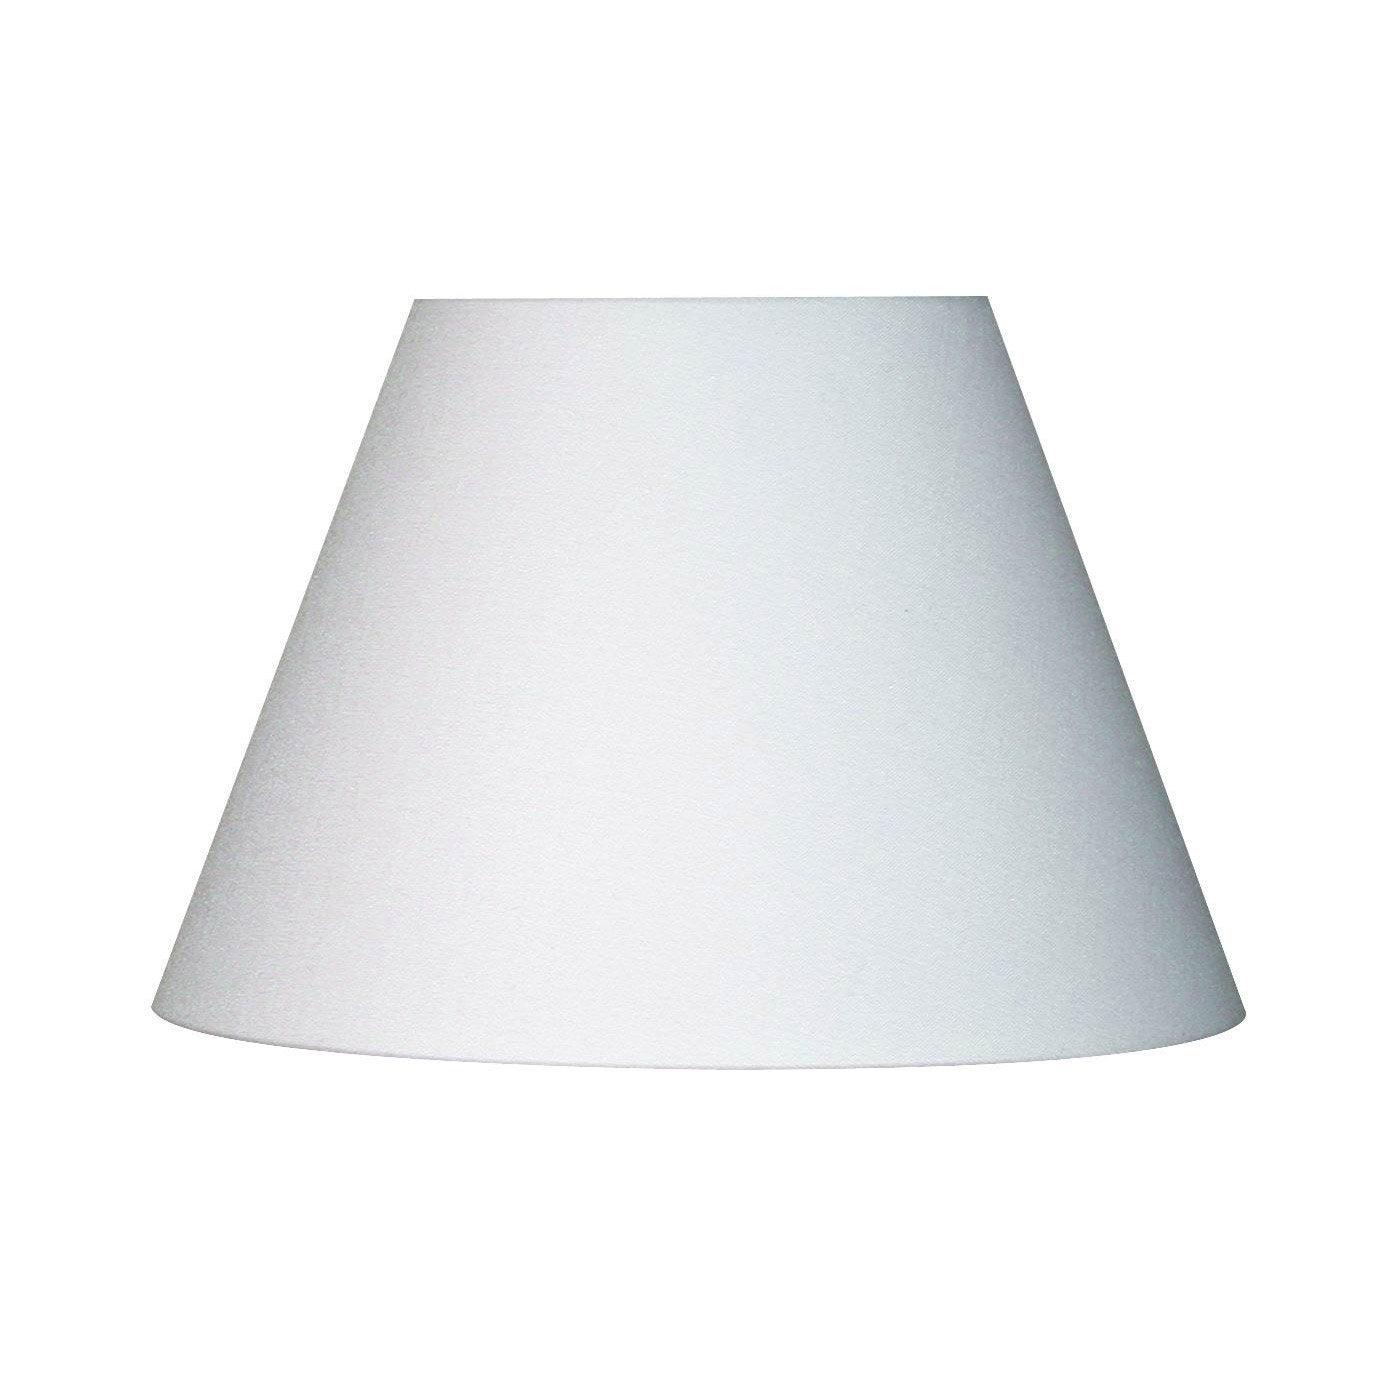 abat jour sweet 25 cm toiline blanc blanc n 0 inspire. Black Bedroom Furniture Sets. Home Design Ideas